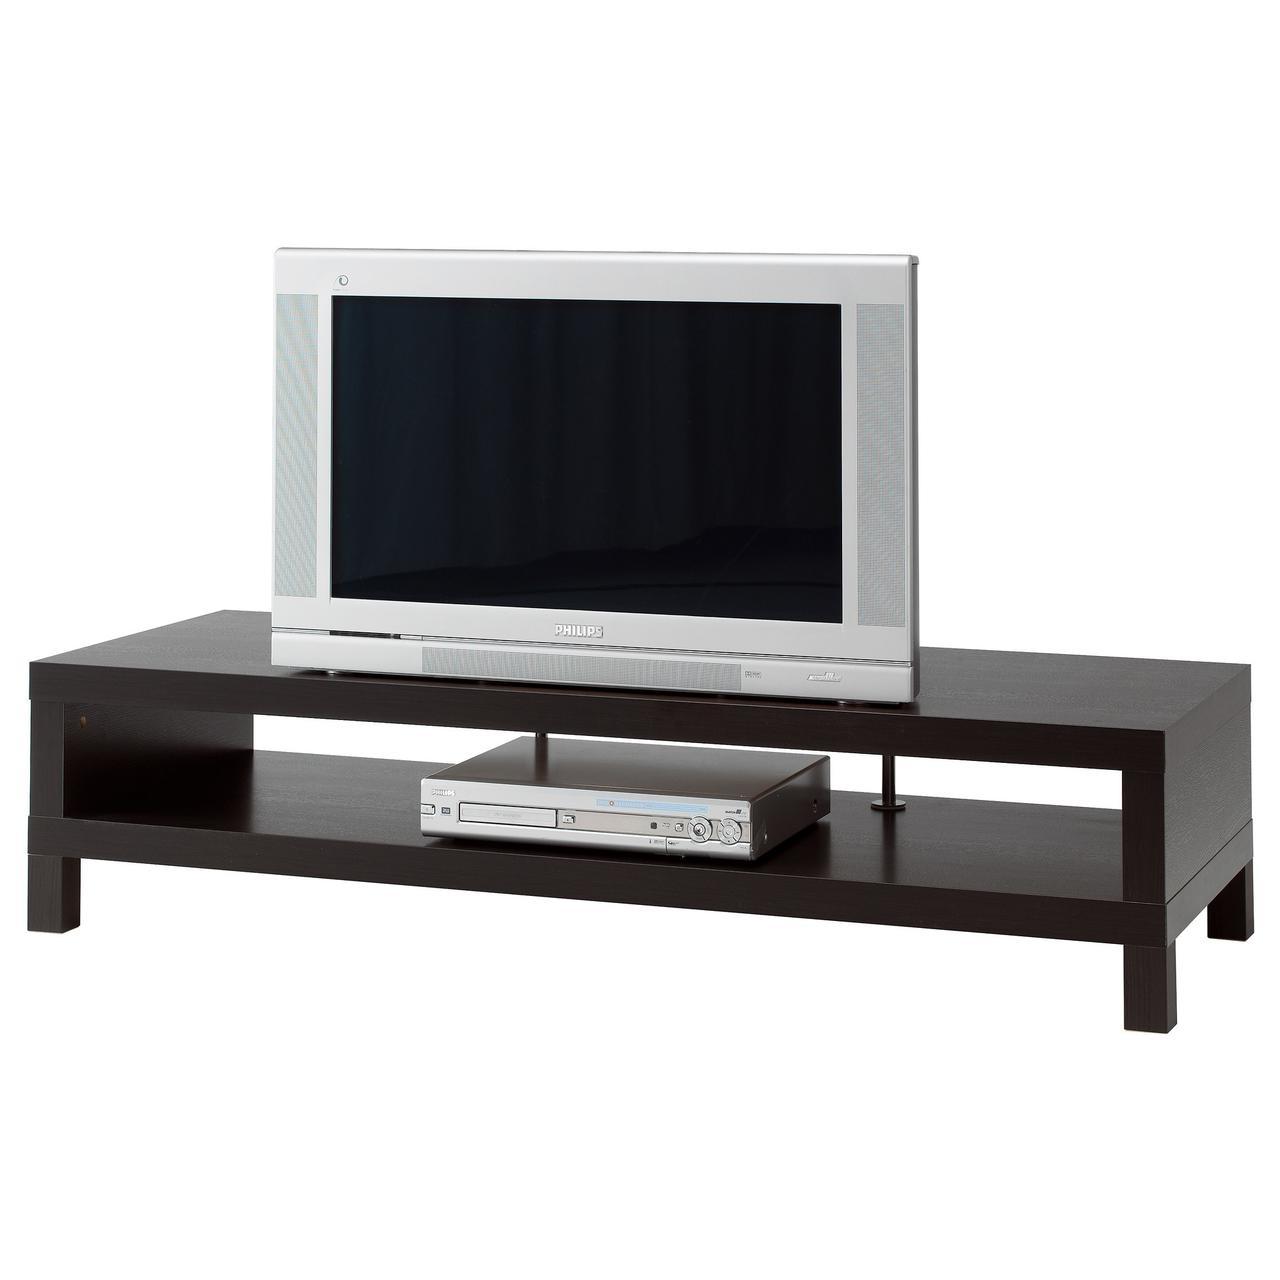 IKEA LACK (201.053.41) Тумба под ТВ